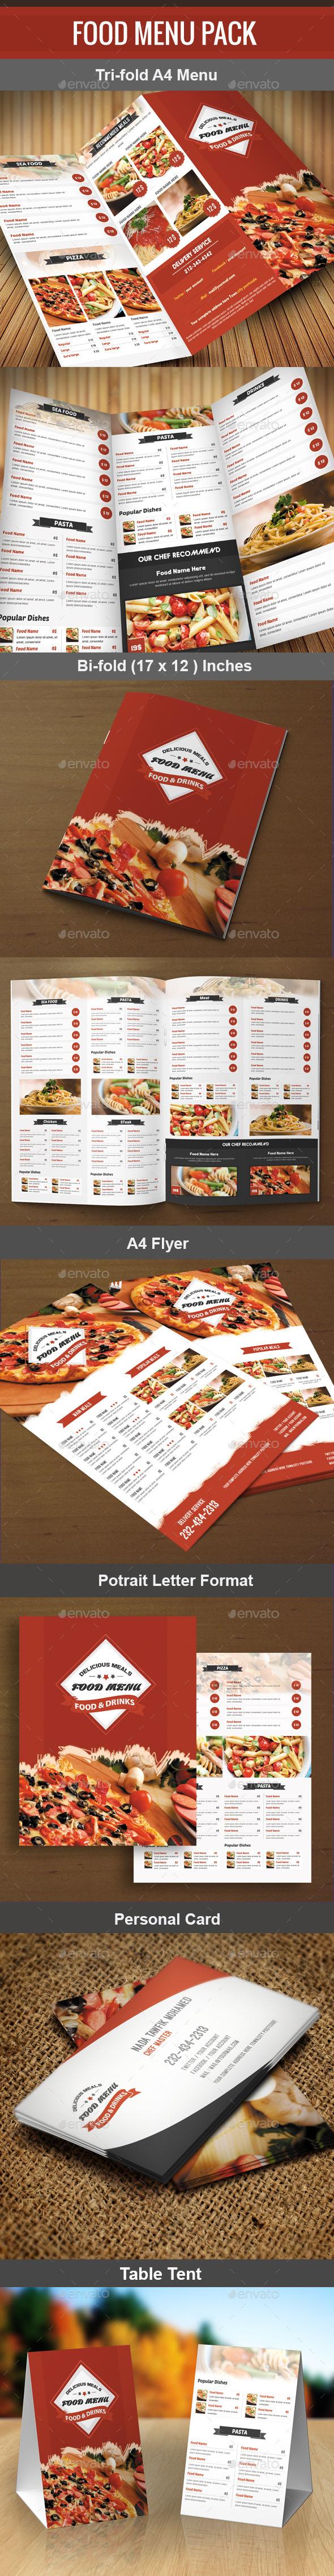 GraphicRiver Food Menu Pack 6 11156416